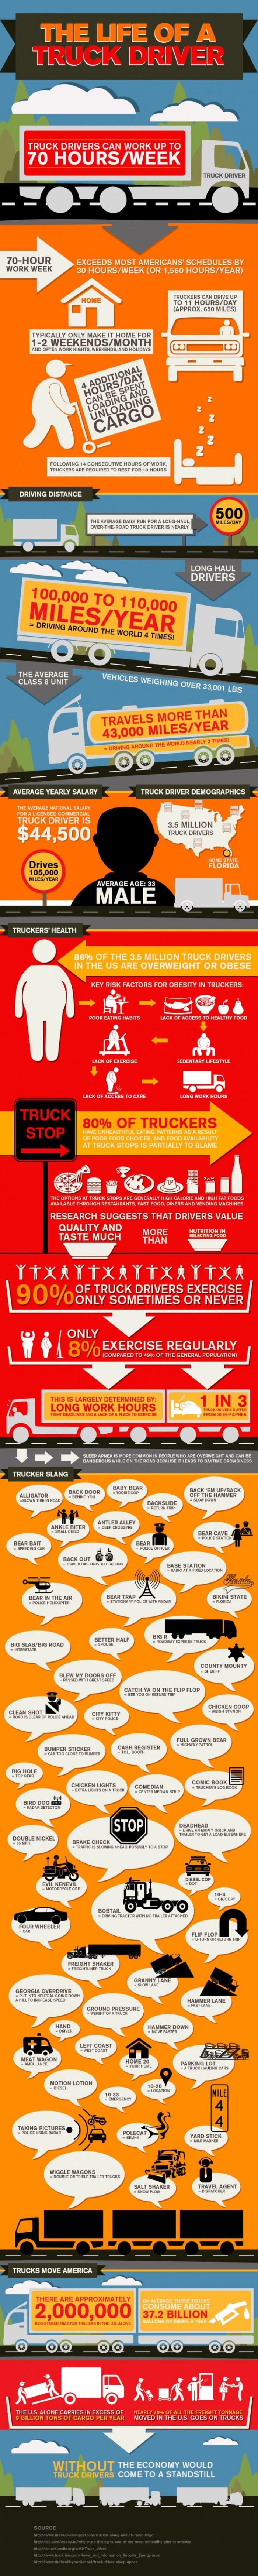 Truck Driver Life - Liquid Trucking